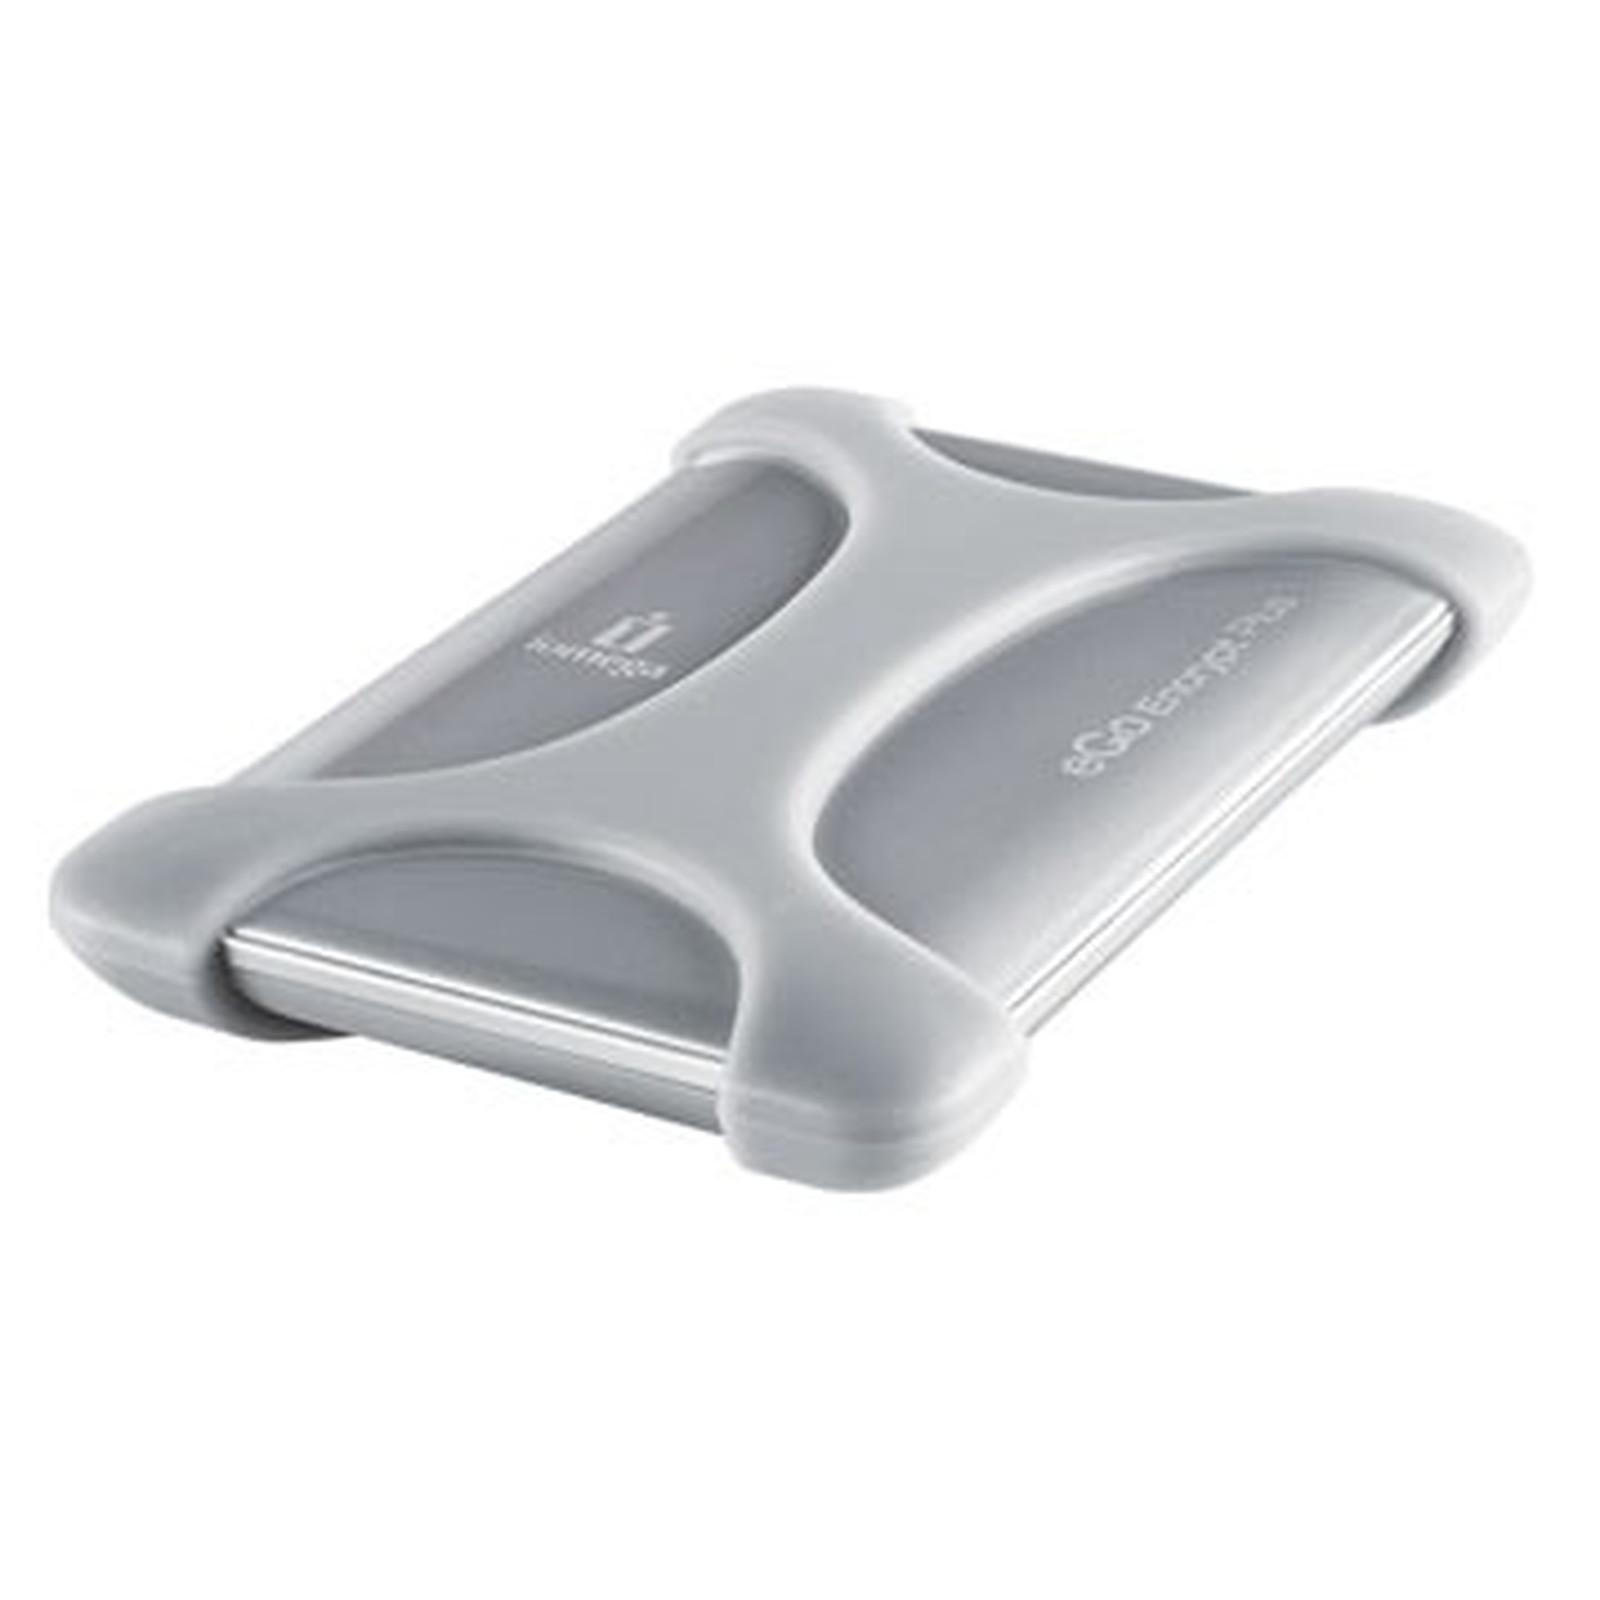 Iomega eGo Encrypt Plus Portable Hard Drive 500 GB USB 2.0 Argent